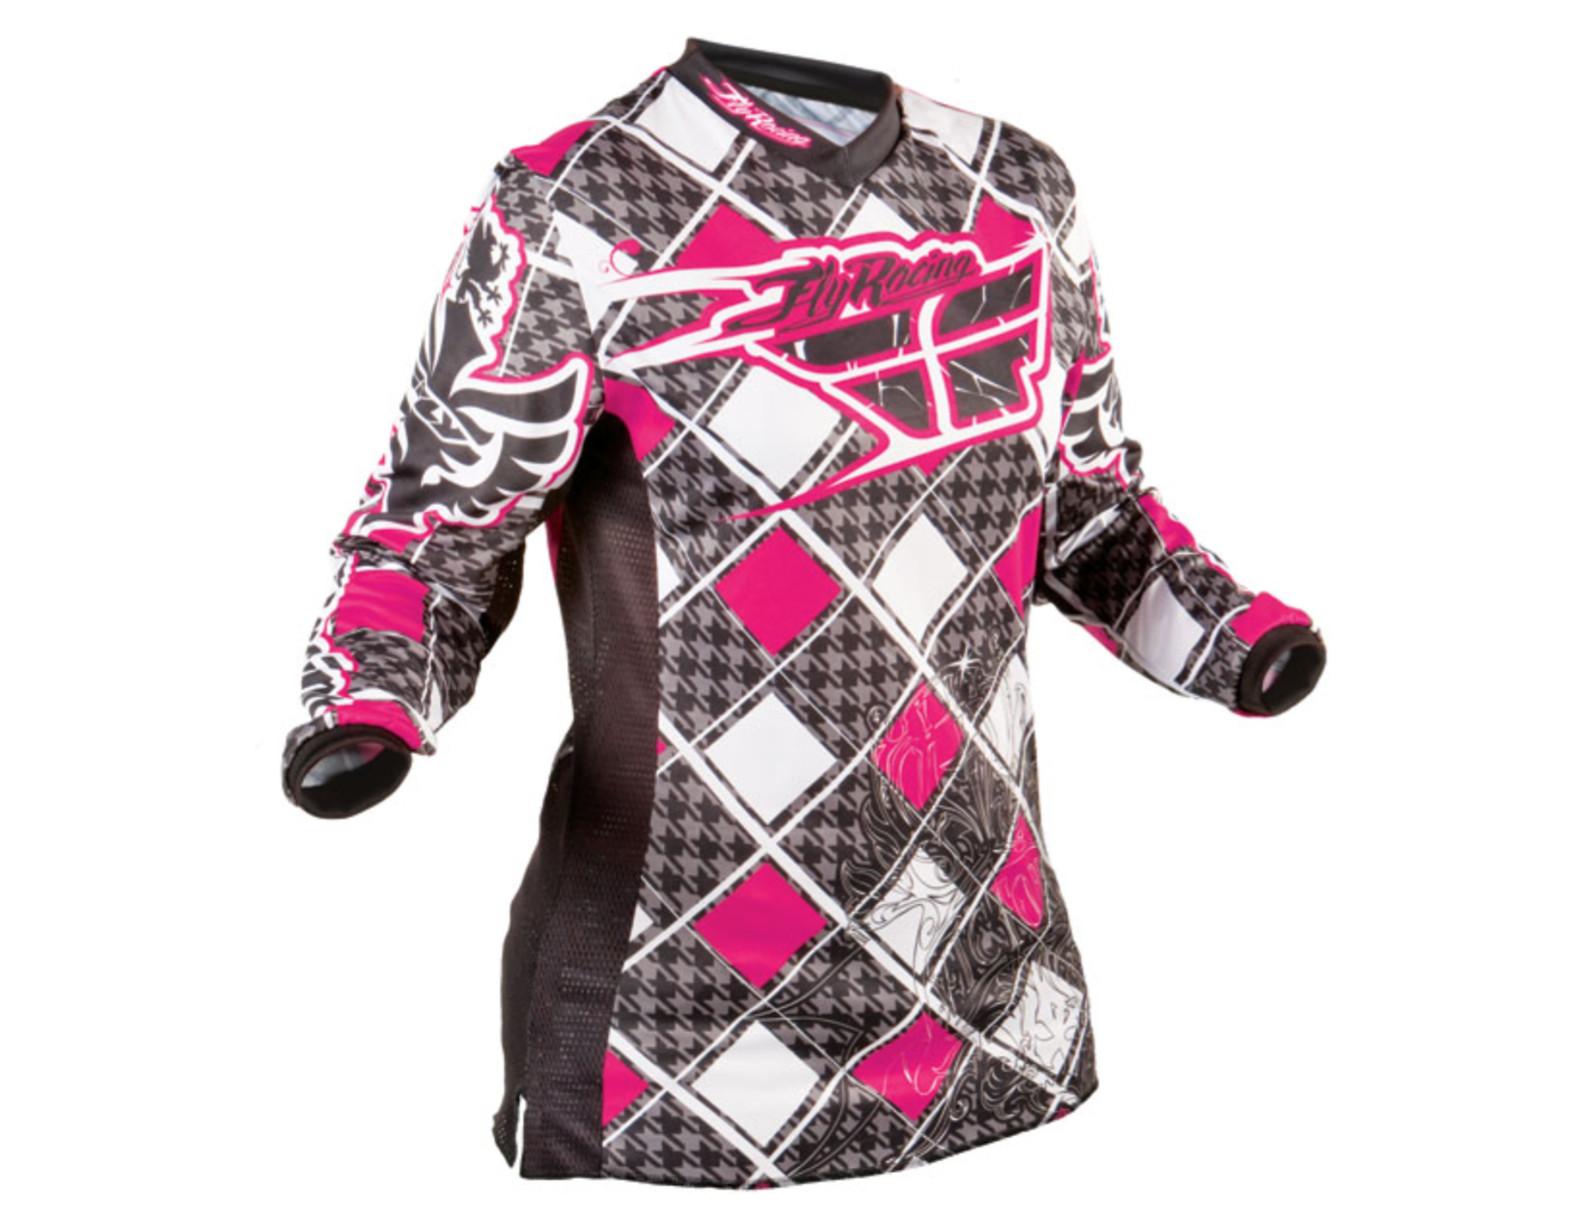 Fly Racing (2010) Women's Kinetic Jersey 2010 Fly Racing Kinetic Girls Jersey (pink)